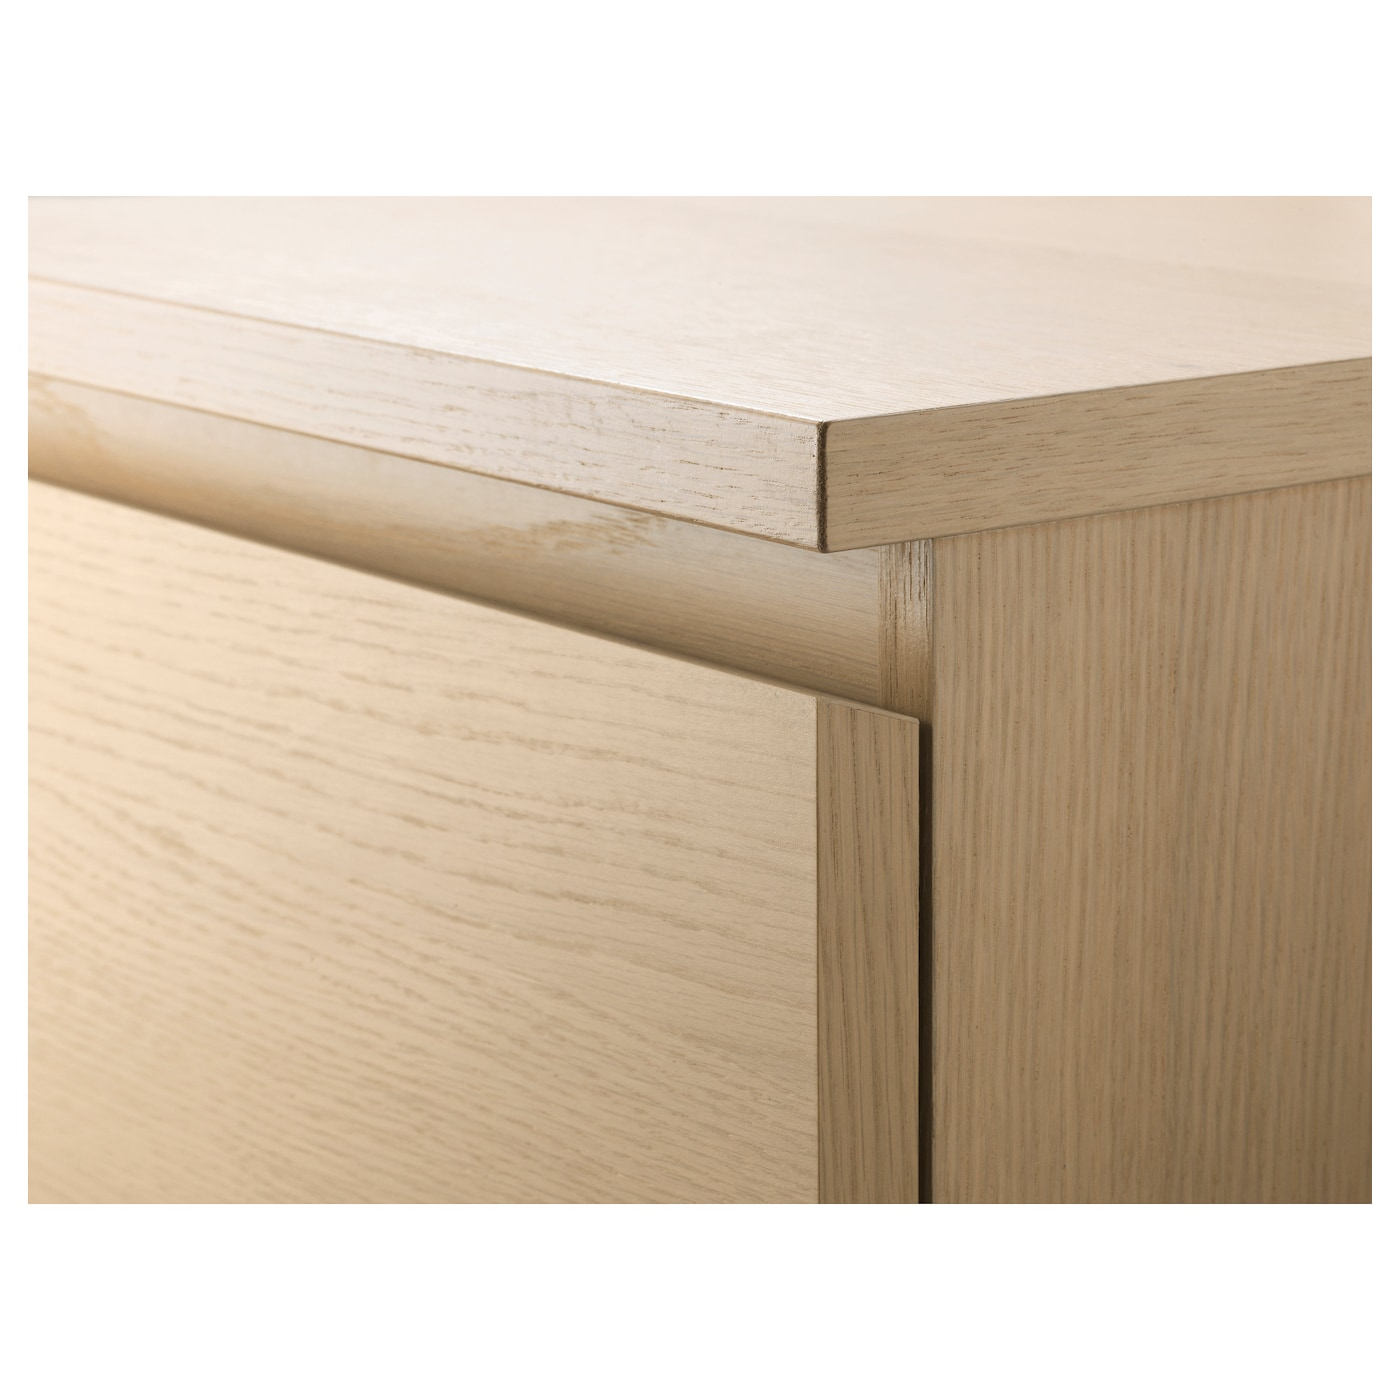 "MALM 4-drawer chest white stained oak veneer 31 1/2 "" 18 7/8 "" 39 3/8 "" 16 7/8 """